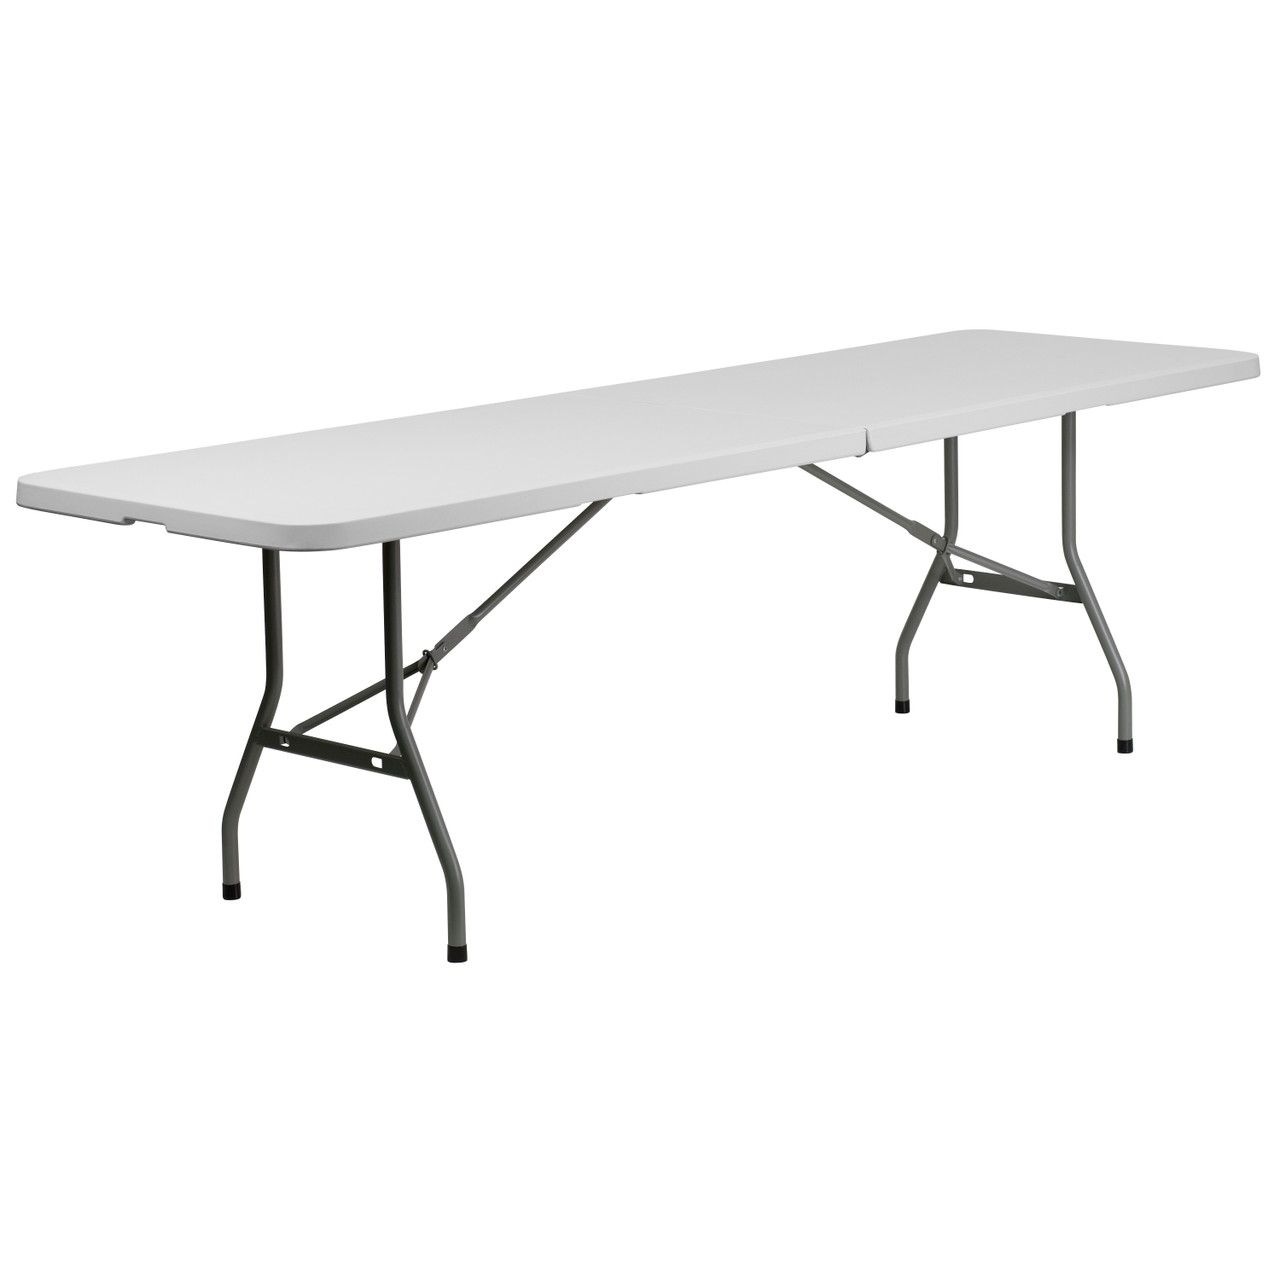 - 10-Pack: Advantage 8' Bifold Plastic Folding Table [10-RB-3096FH